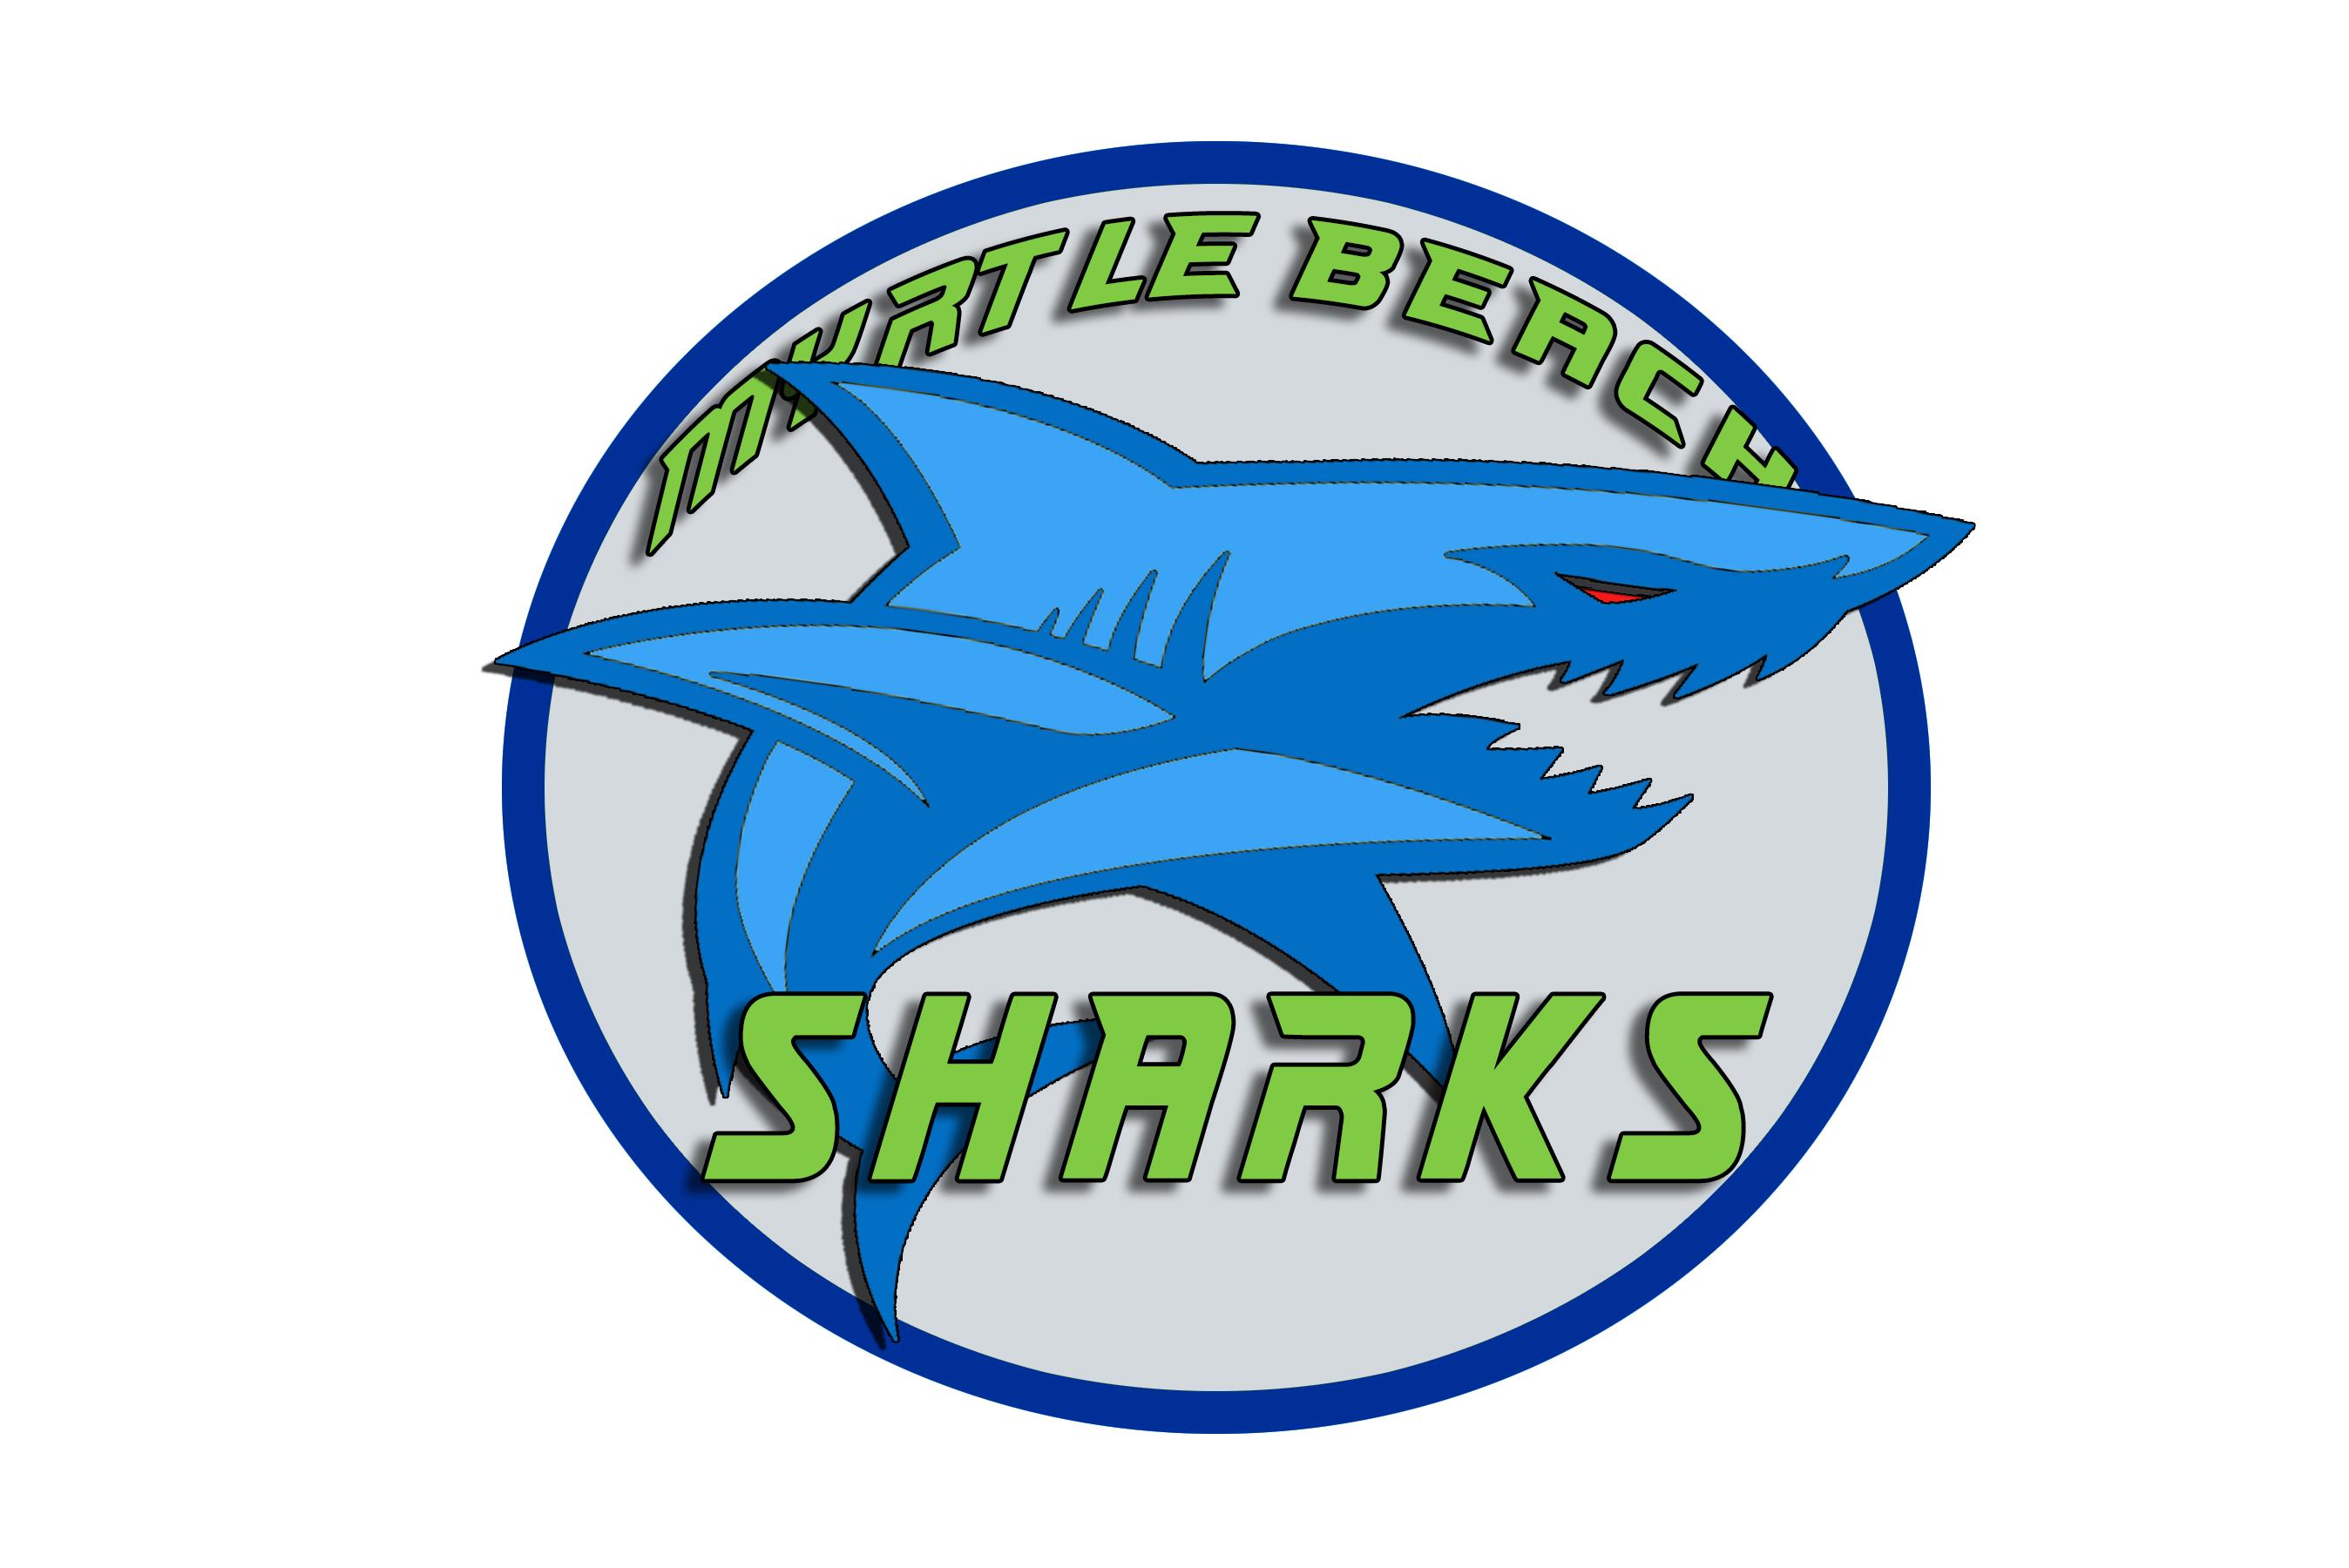 Myrtle Beach Sharks